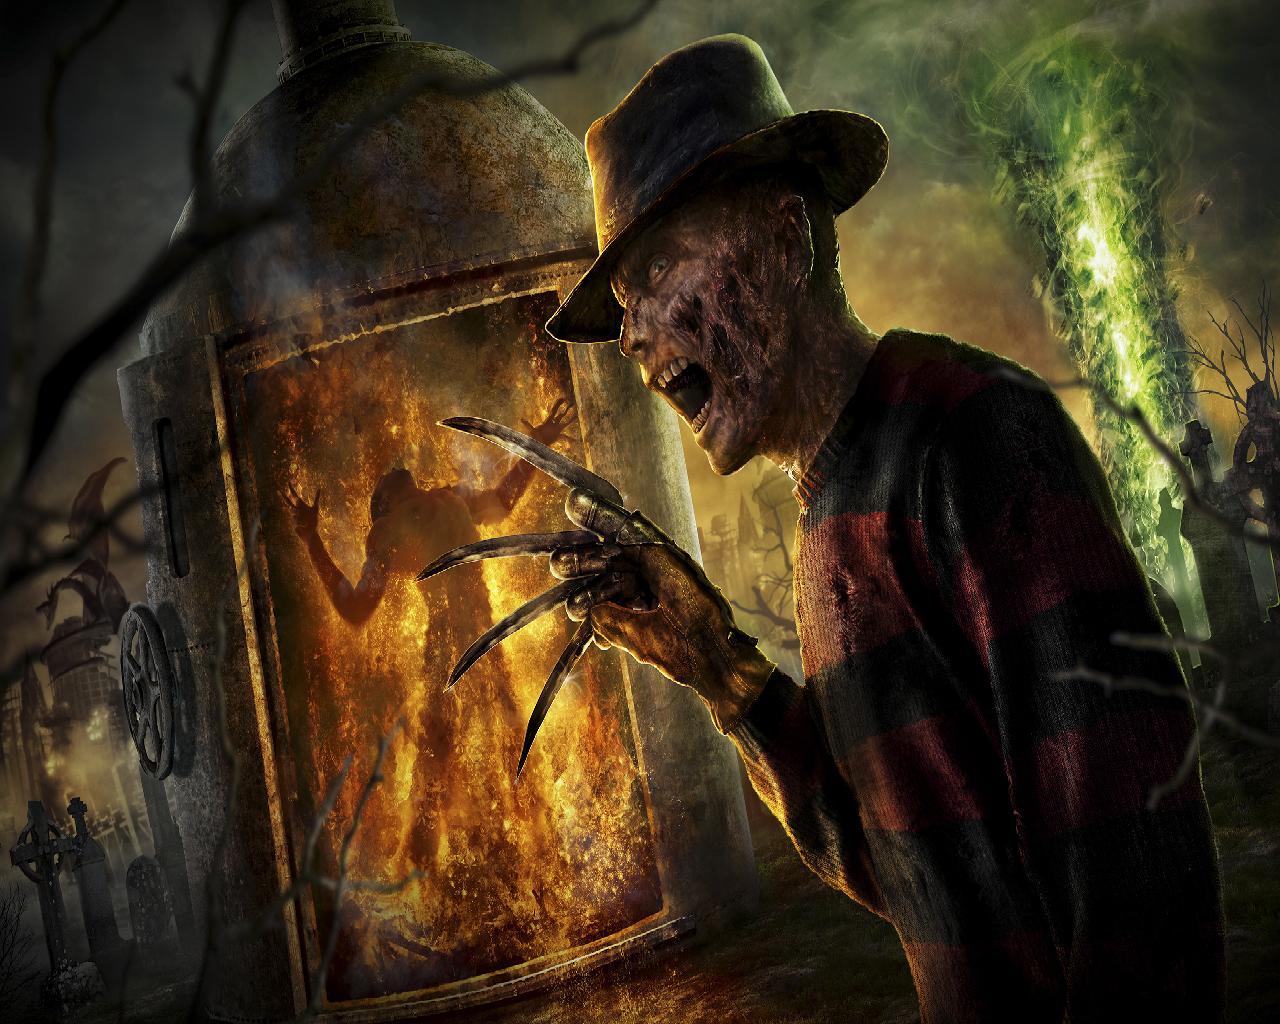 Freddy Krueger wallpaper   ForWallpapercom 1280x1024